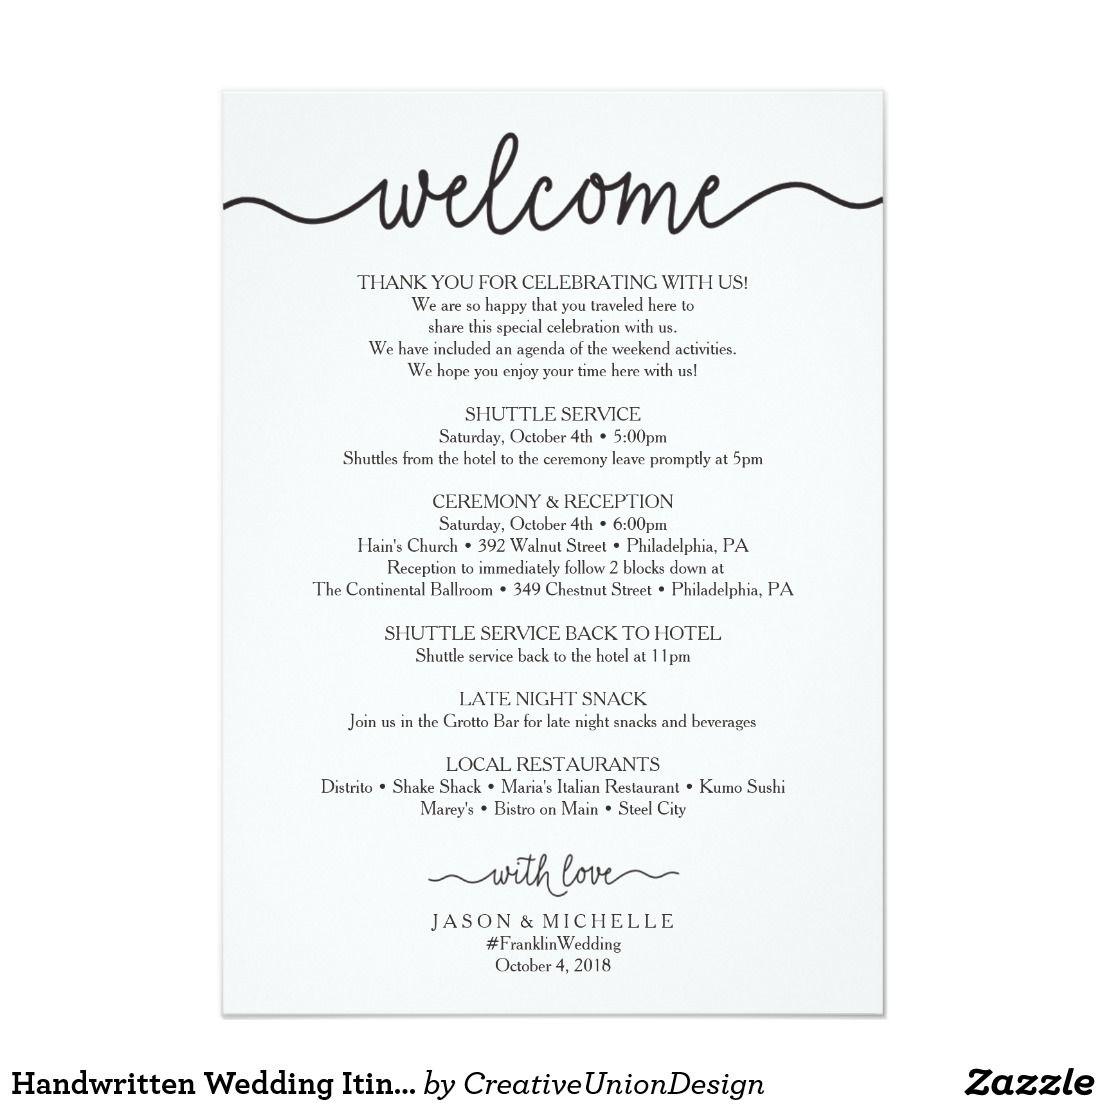 Handwritten Wedding Itinerary Wedding Welcome Zazzle